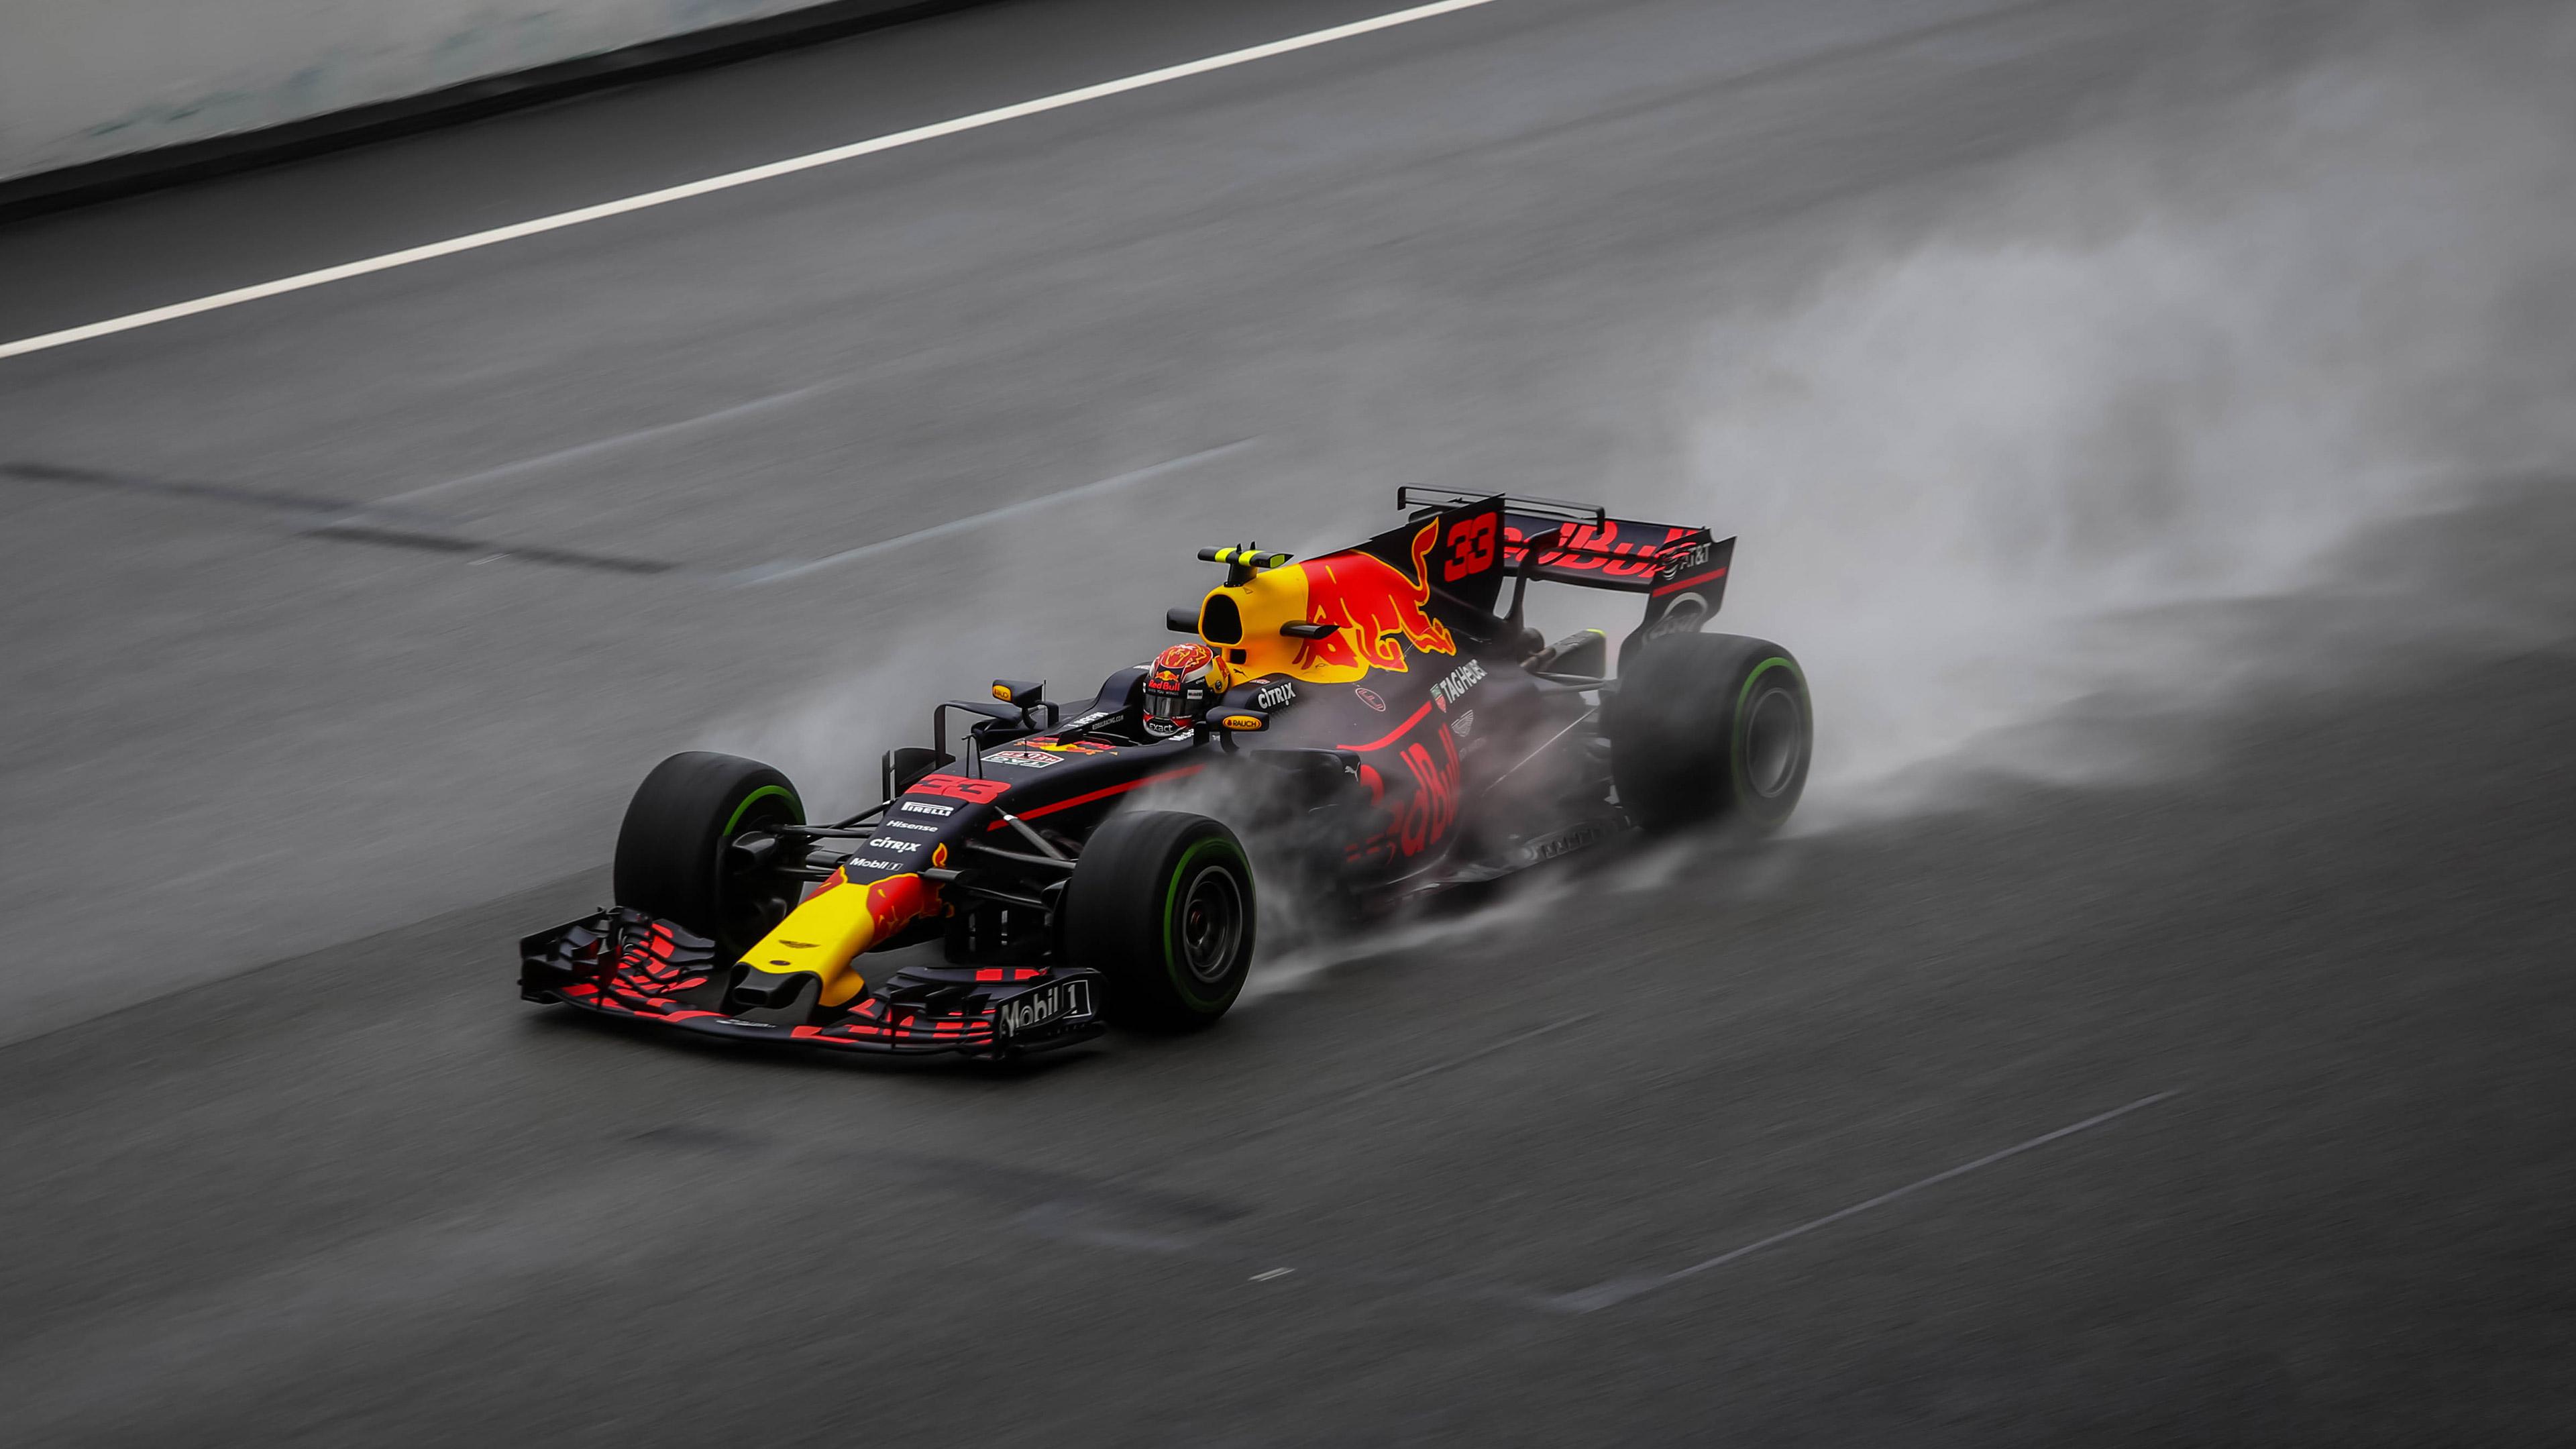 Wallpaper Formula 1 Logo F1 Logo 4k 8k Sports 15267: 2048x1152 2017 Red Bull RB13 4k 2048x1152 Resolution HD 4k